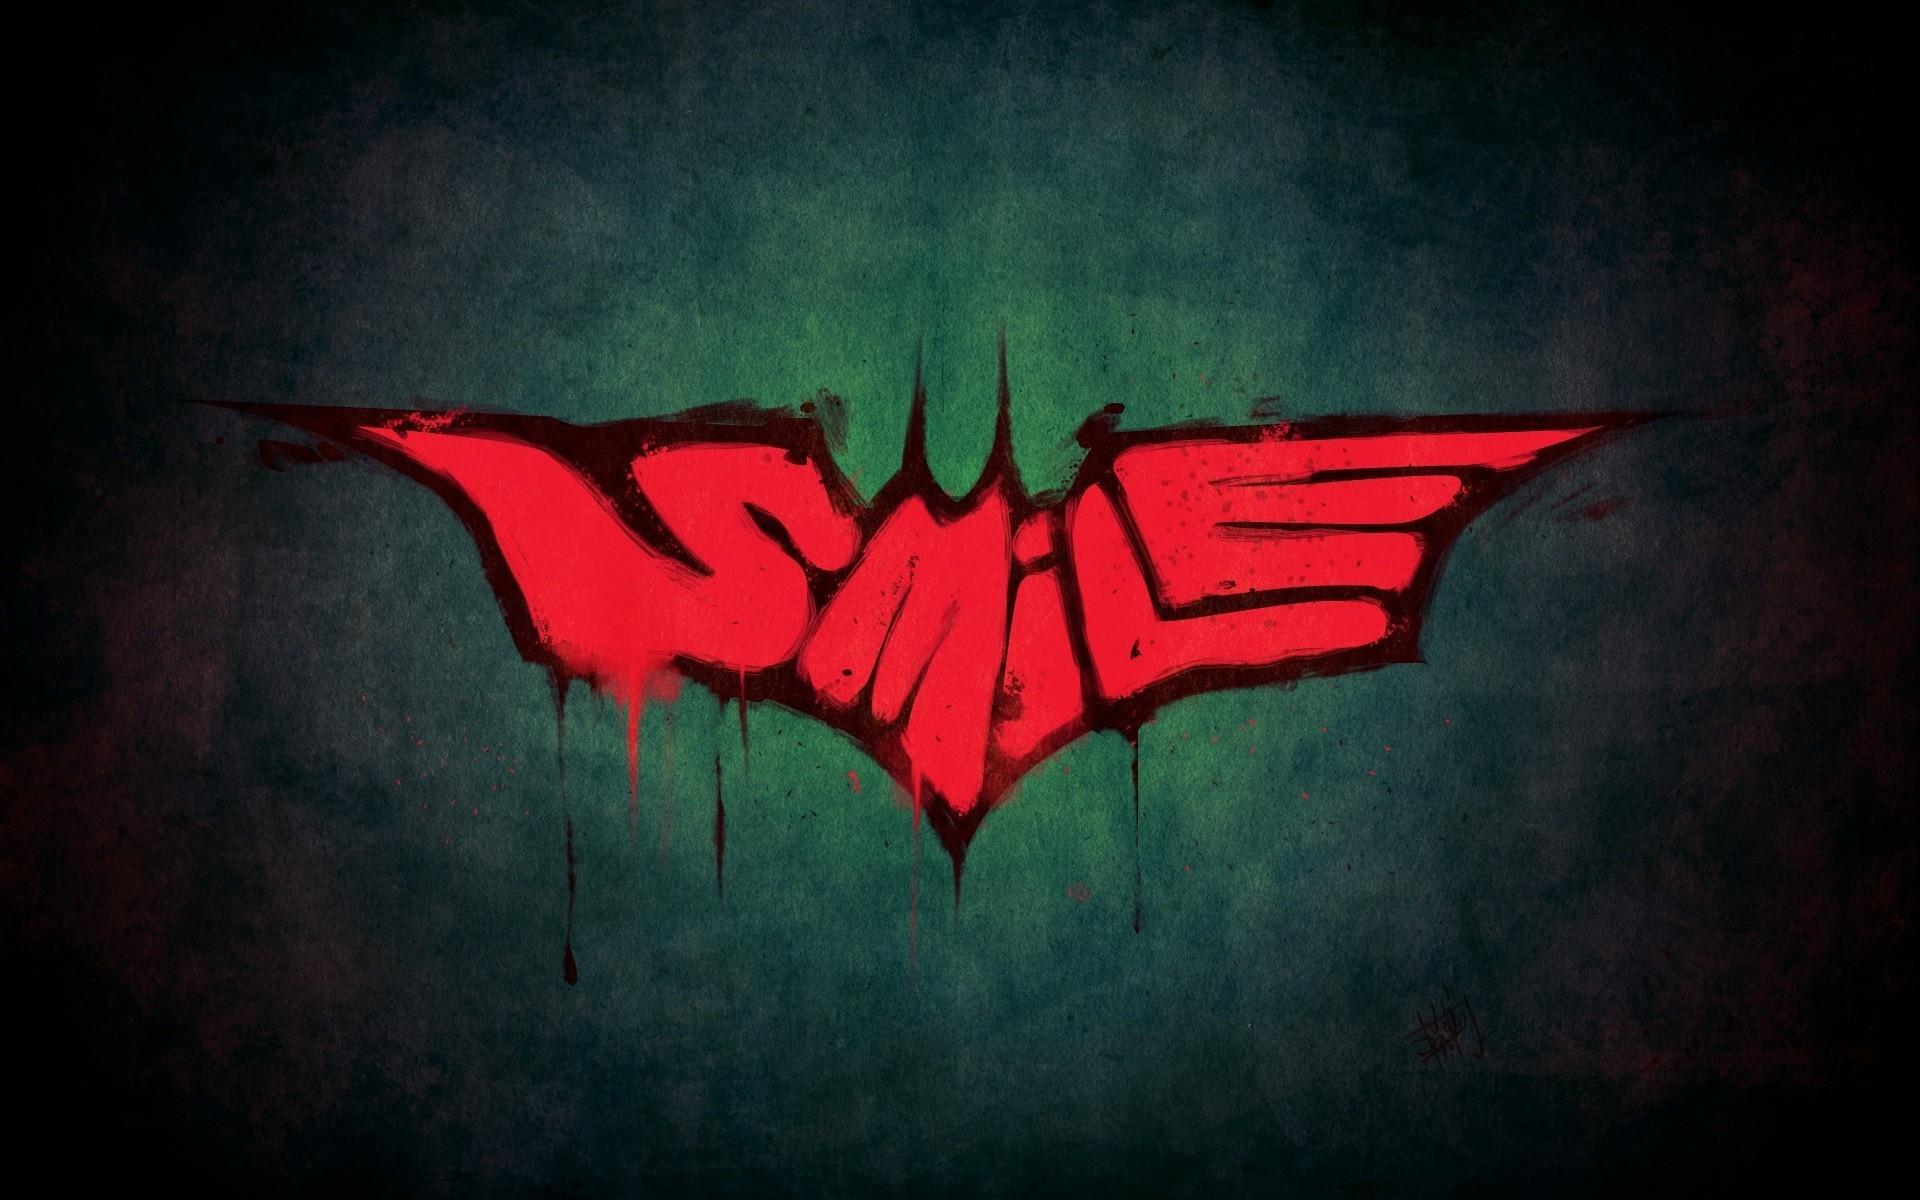 1920x1200 Batman Minimalism Logo Graffiti Wallpapers HD Desktop And Mobile Backgrounds